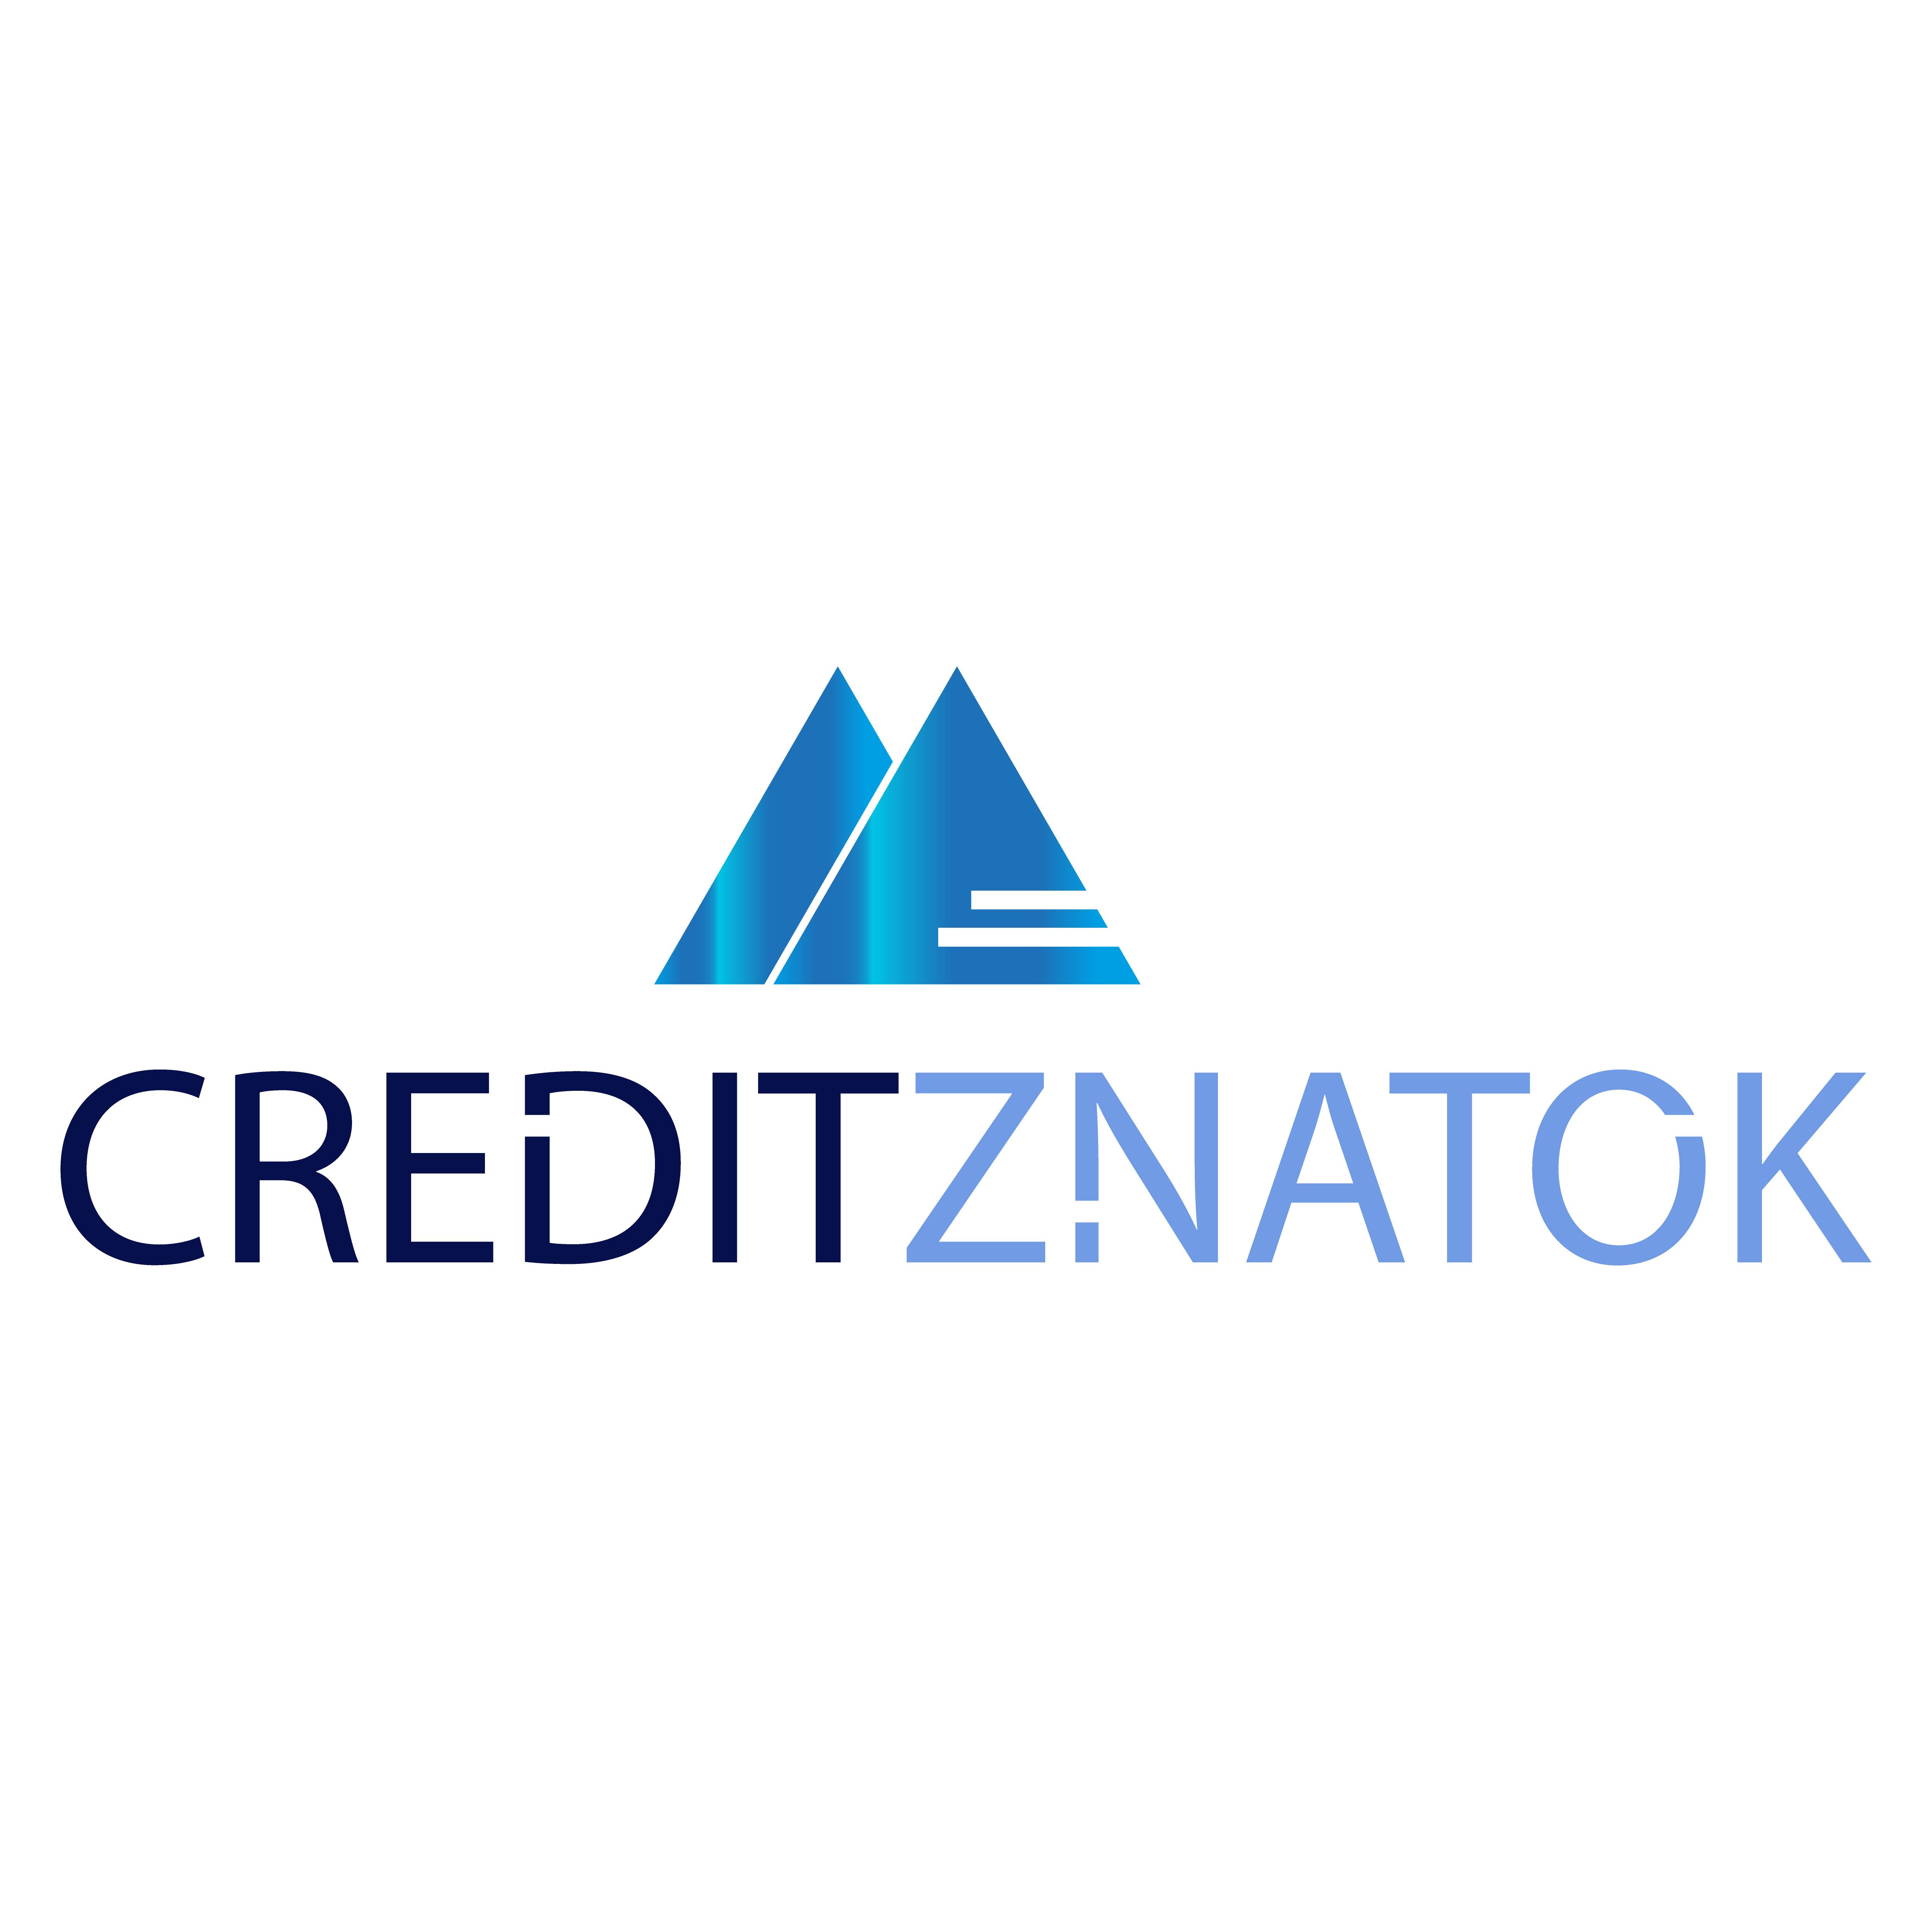 creditznatok.ru - логотип фото f_413589cc645d3e8d.jpg